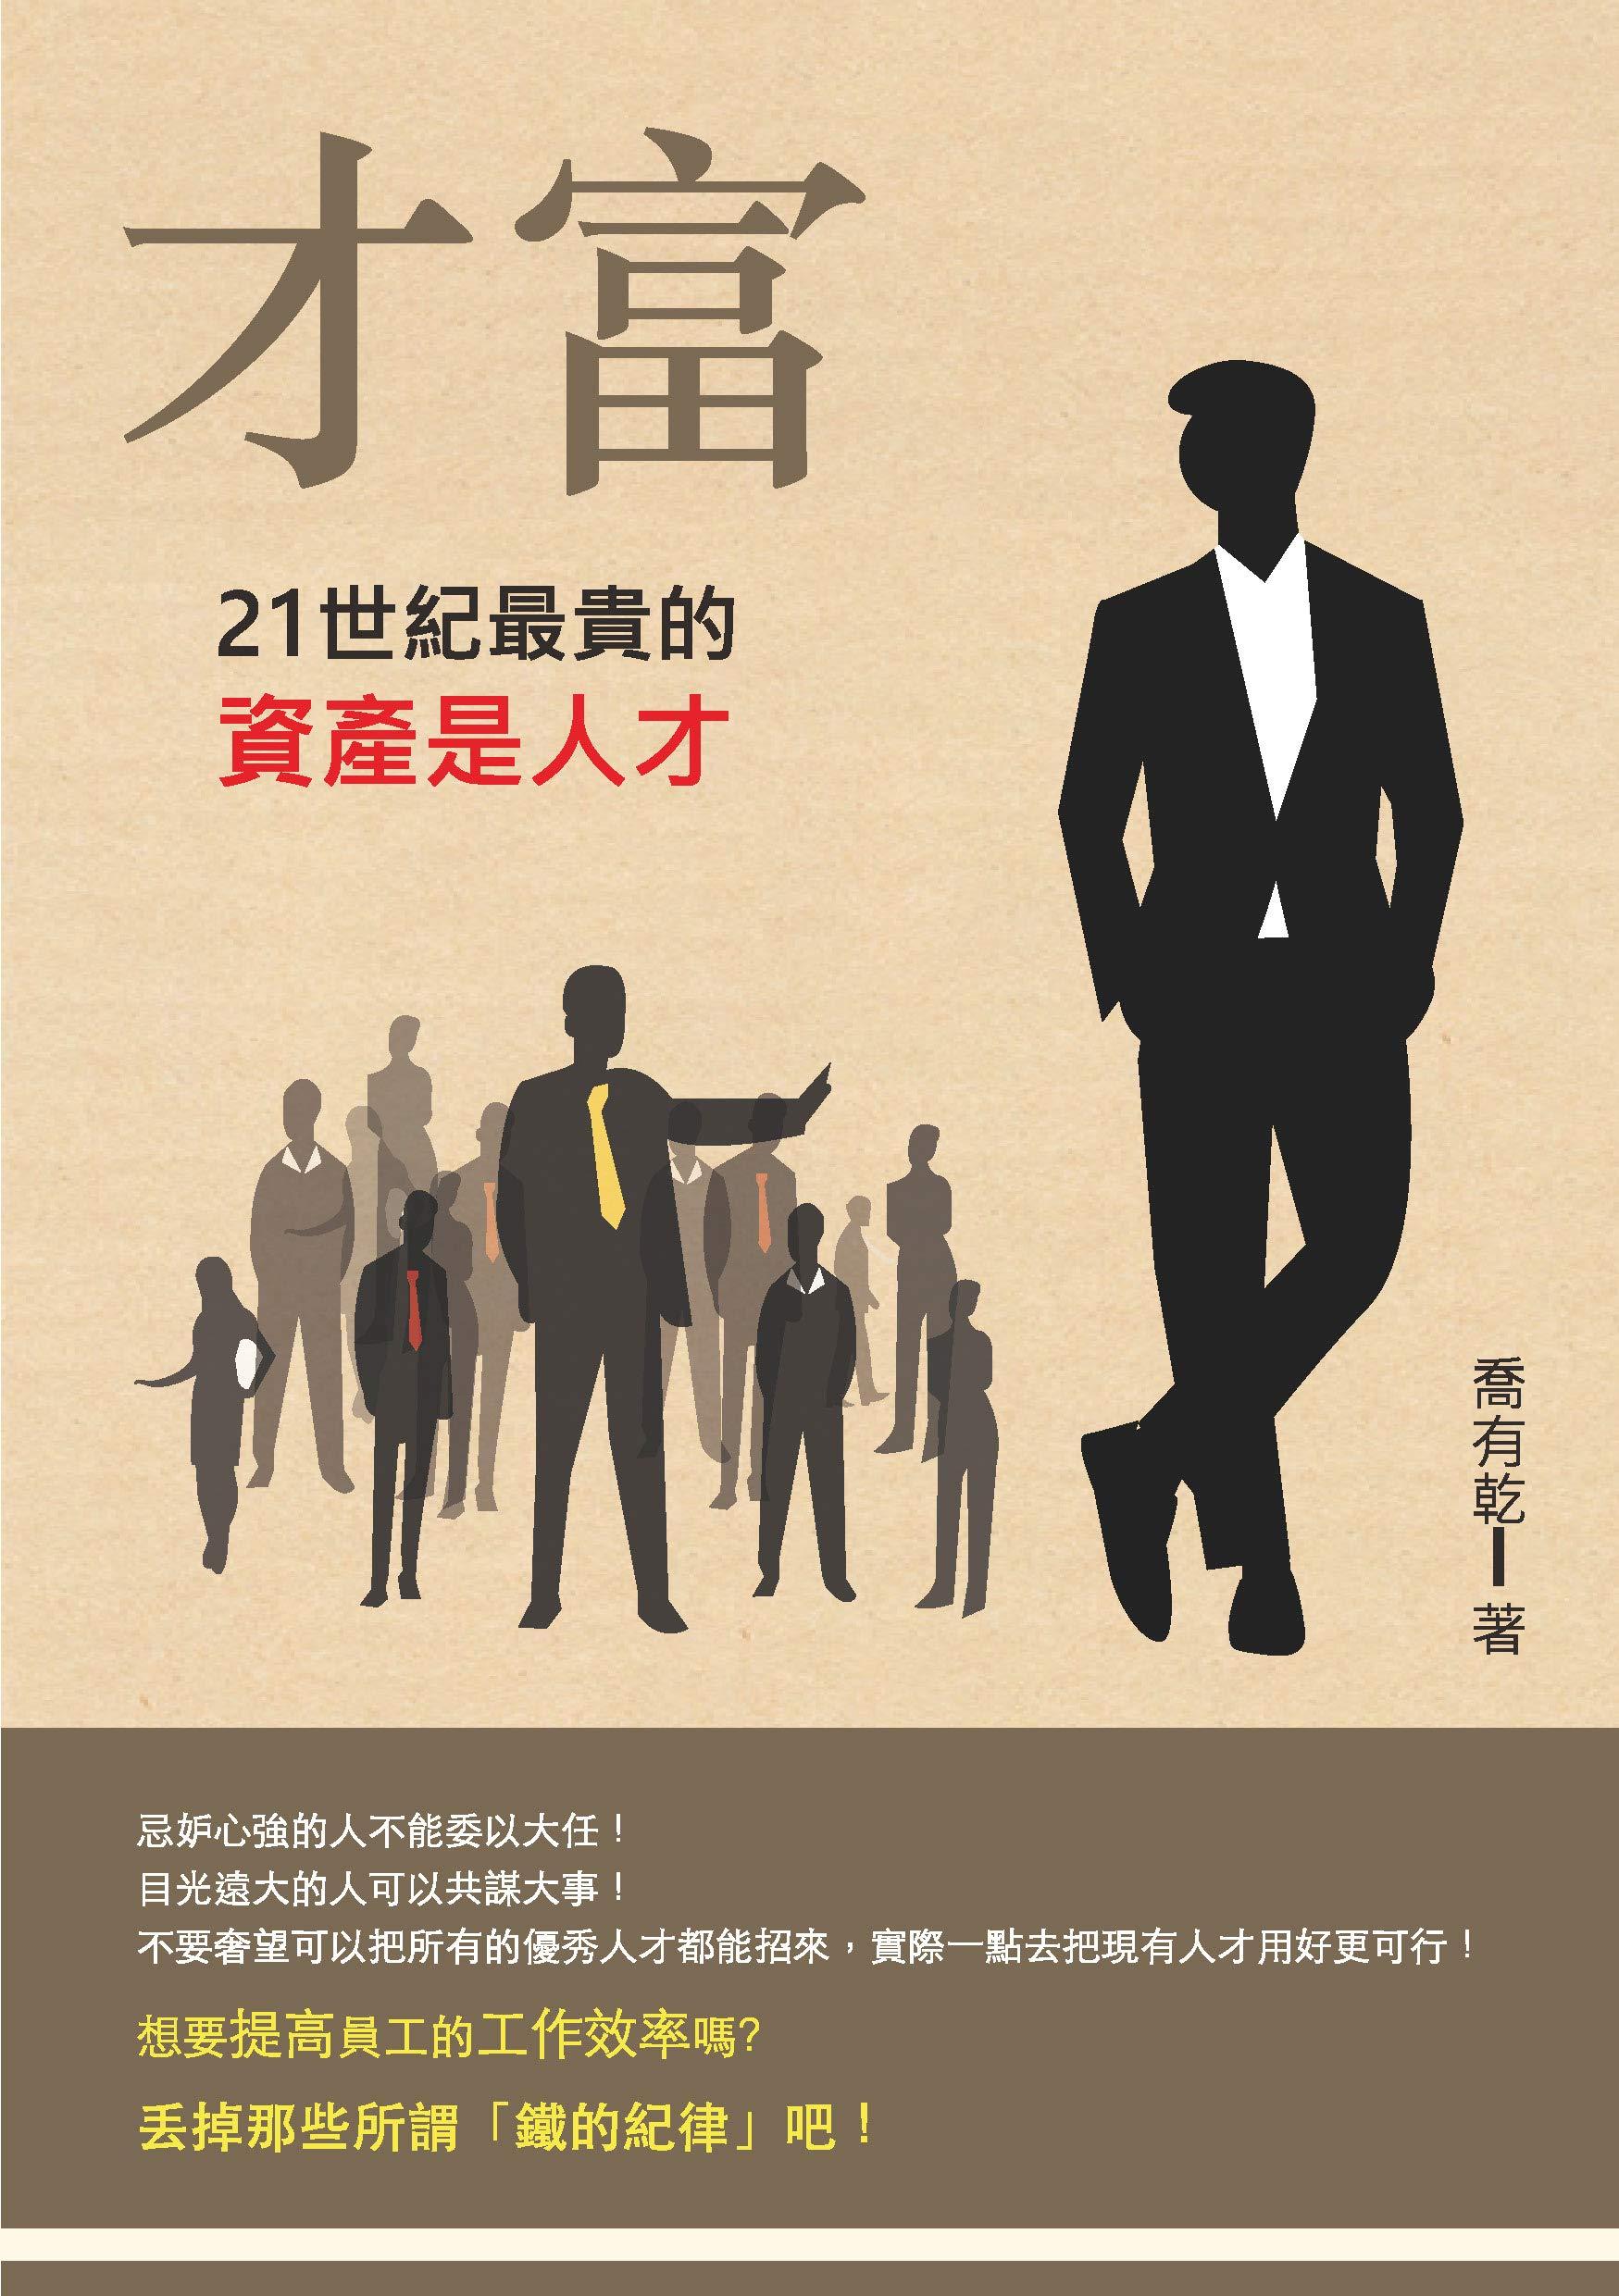 才富:21世紀最貴的資產是人才 (Traditional Chinese Edition)